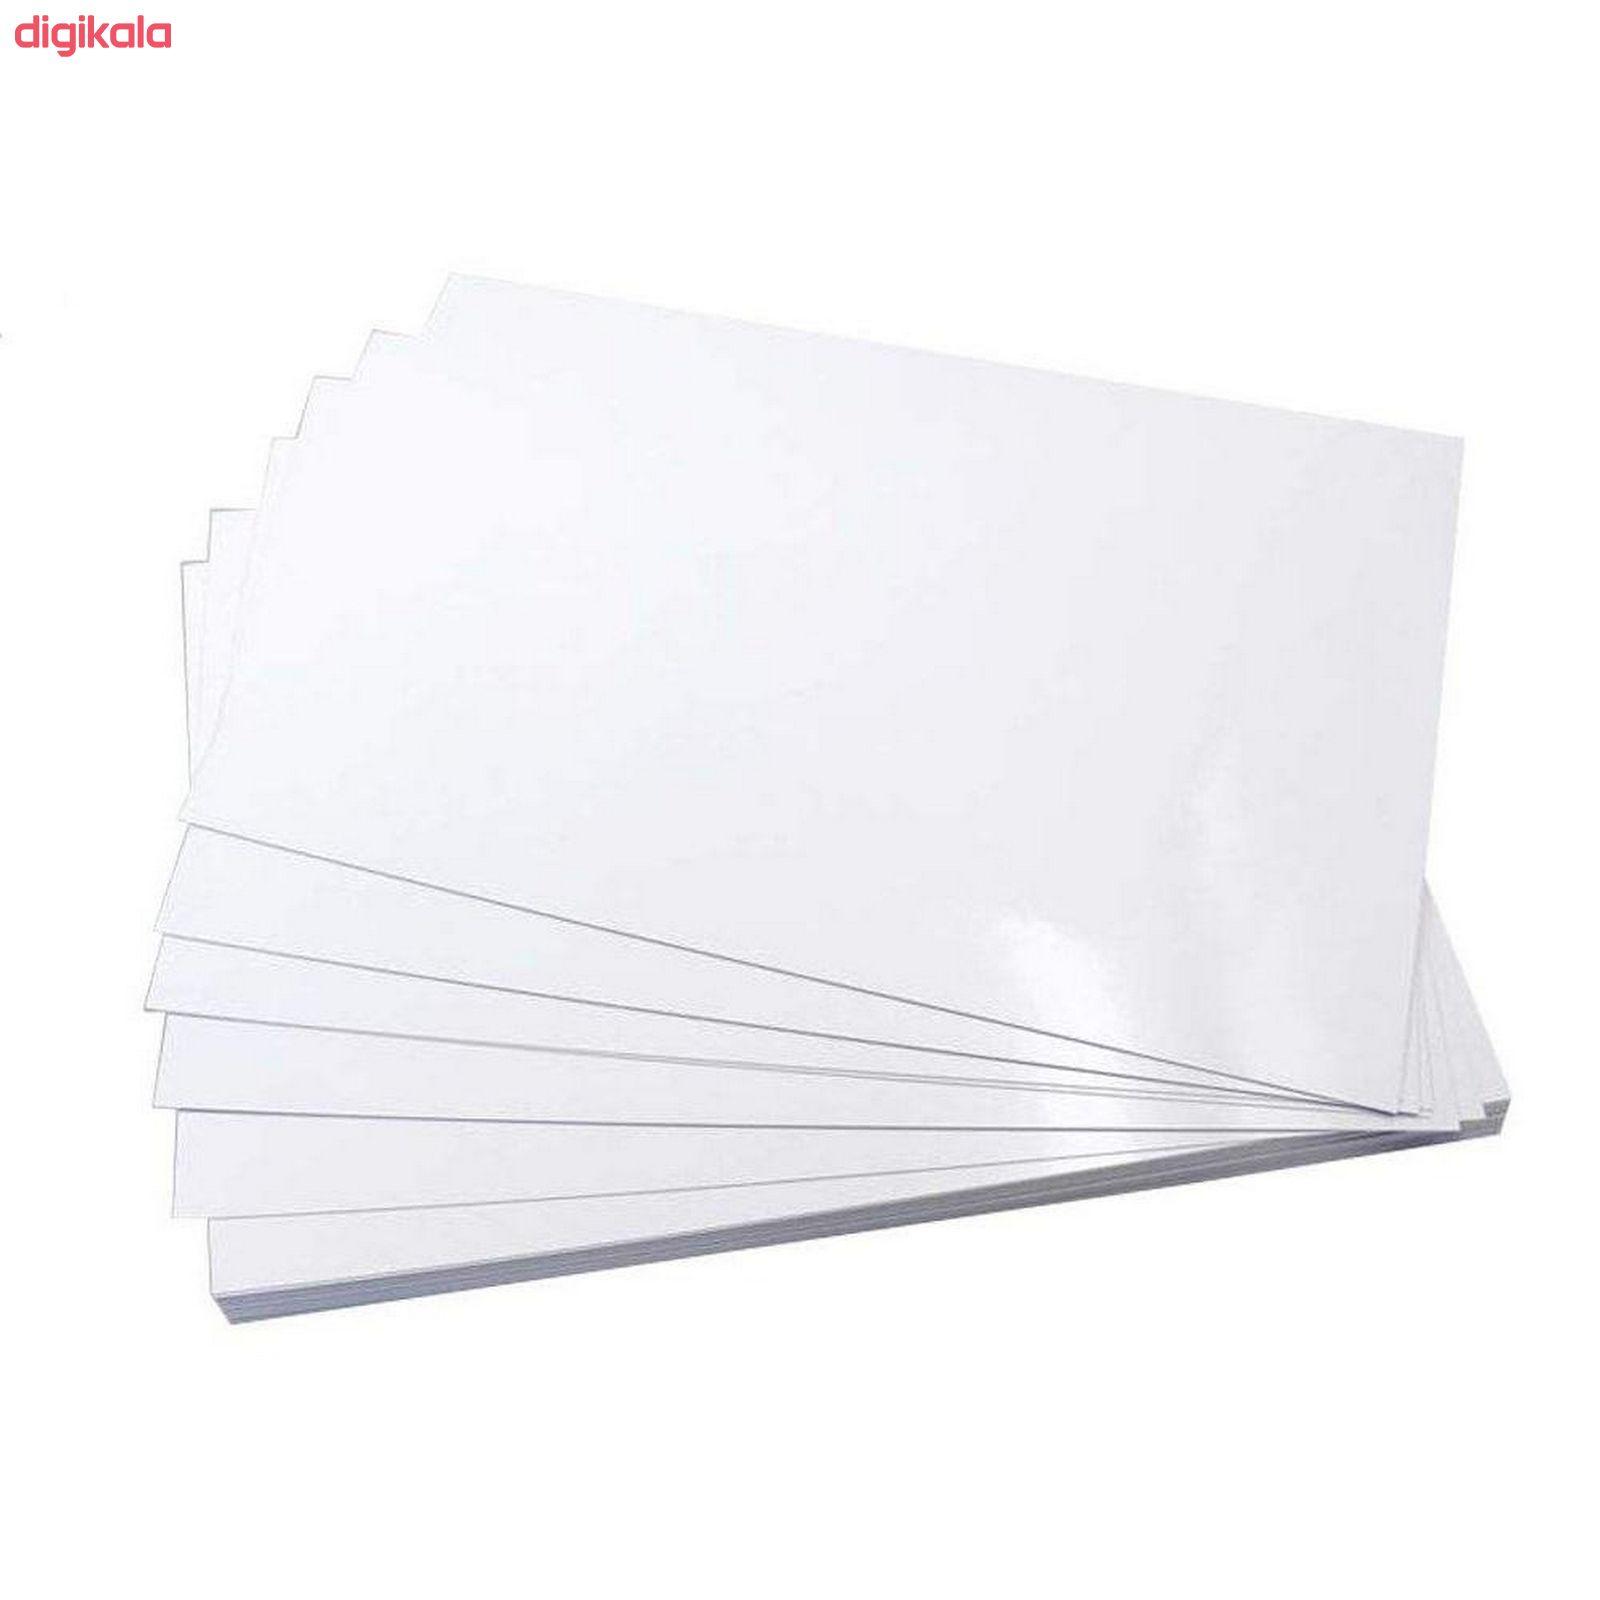 کاغذ A5 هومانه مدل HMNH-5-50 بسته 50 عددی main 1 2